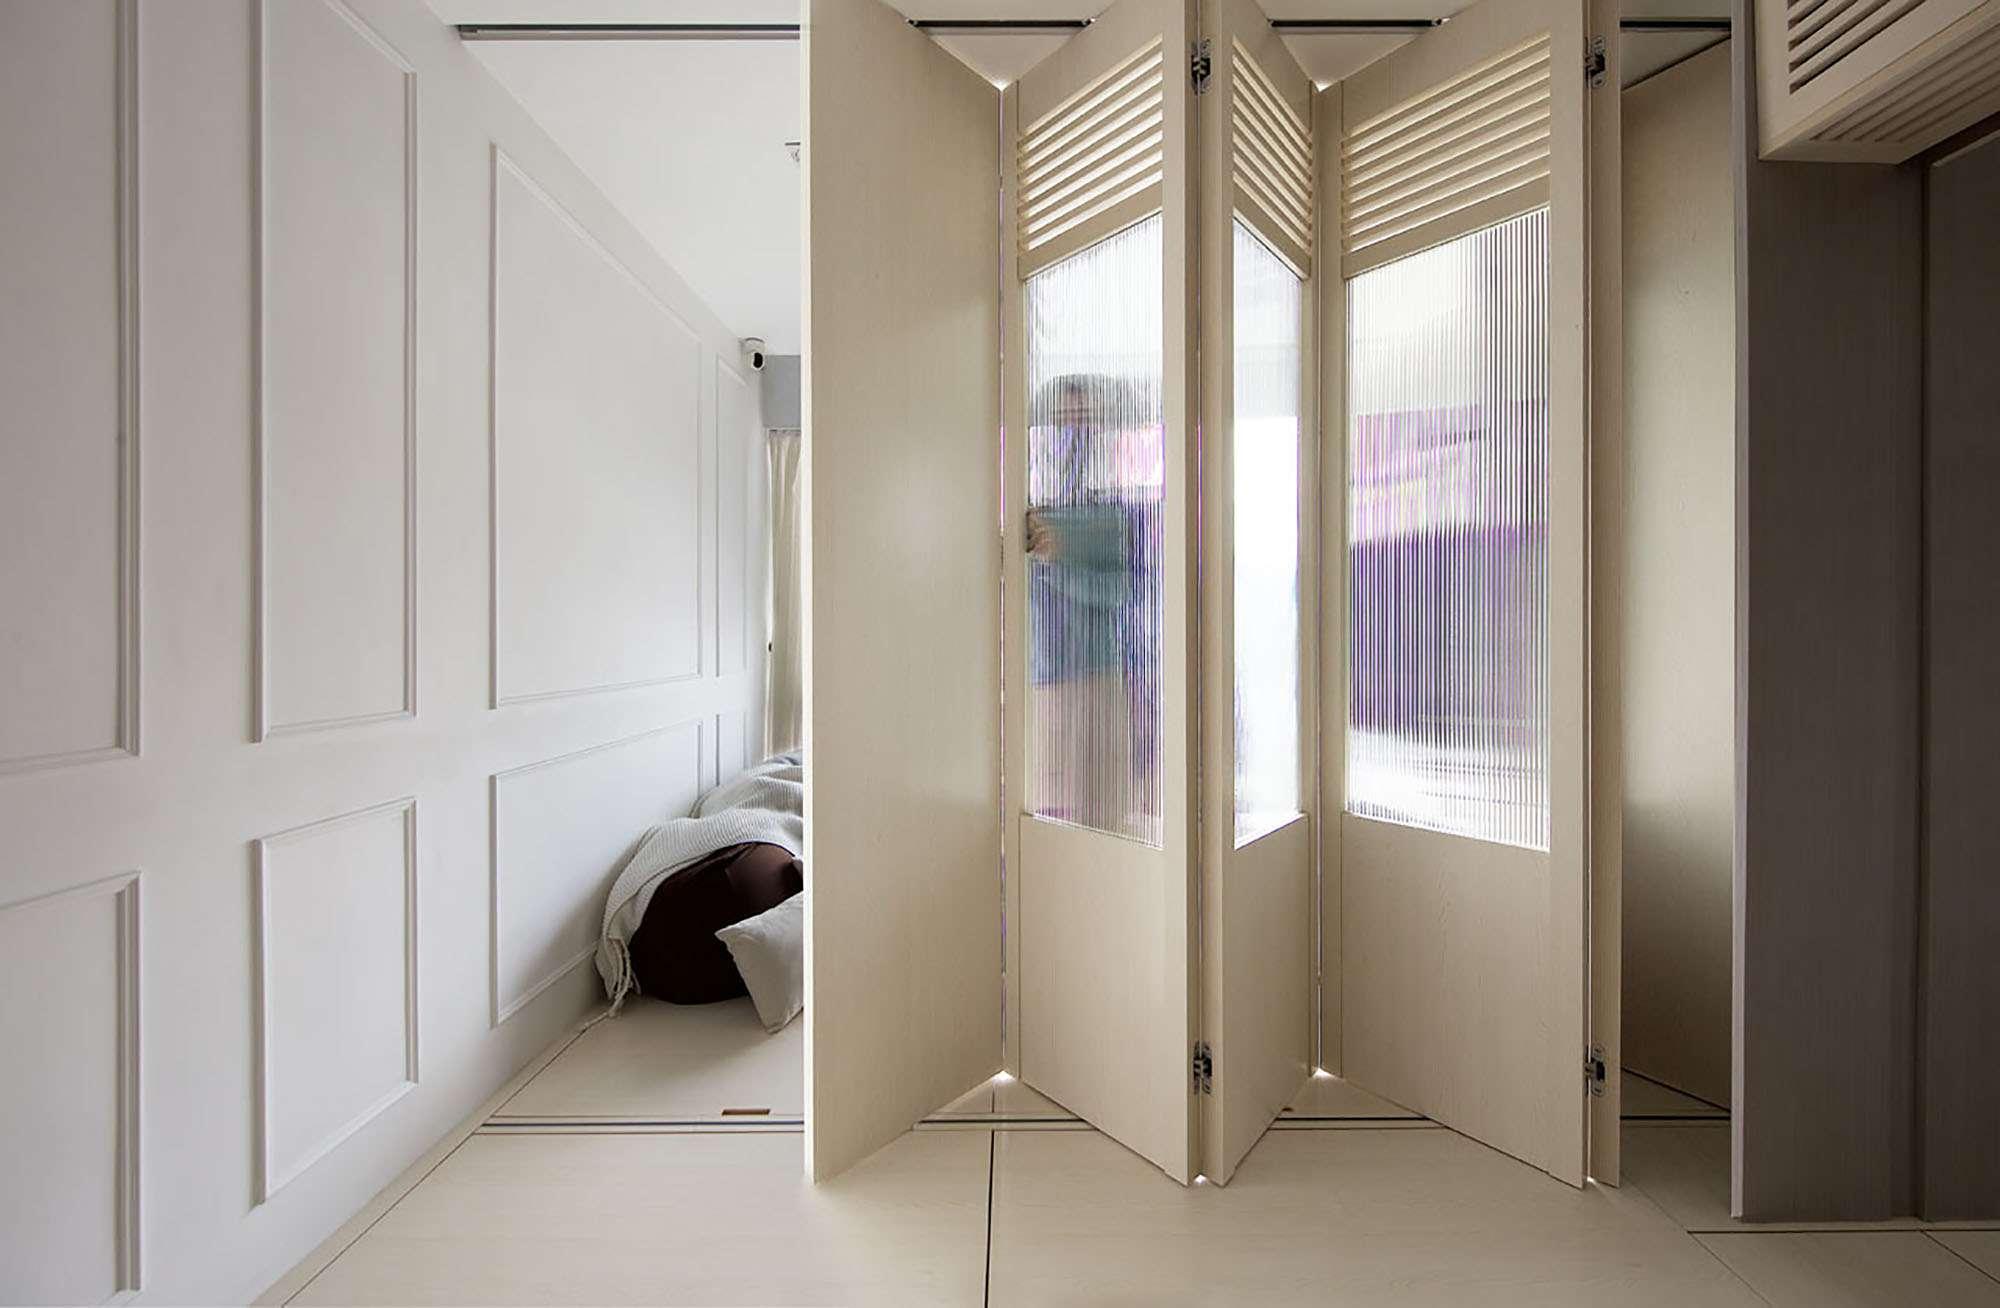 Smart Zendo micro-apartment by Sim-Plex Design Studio louvers